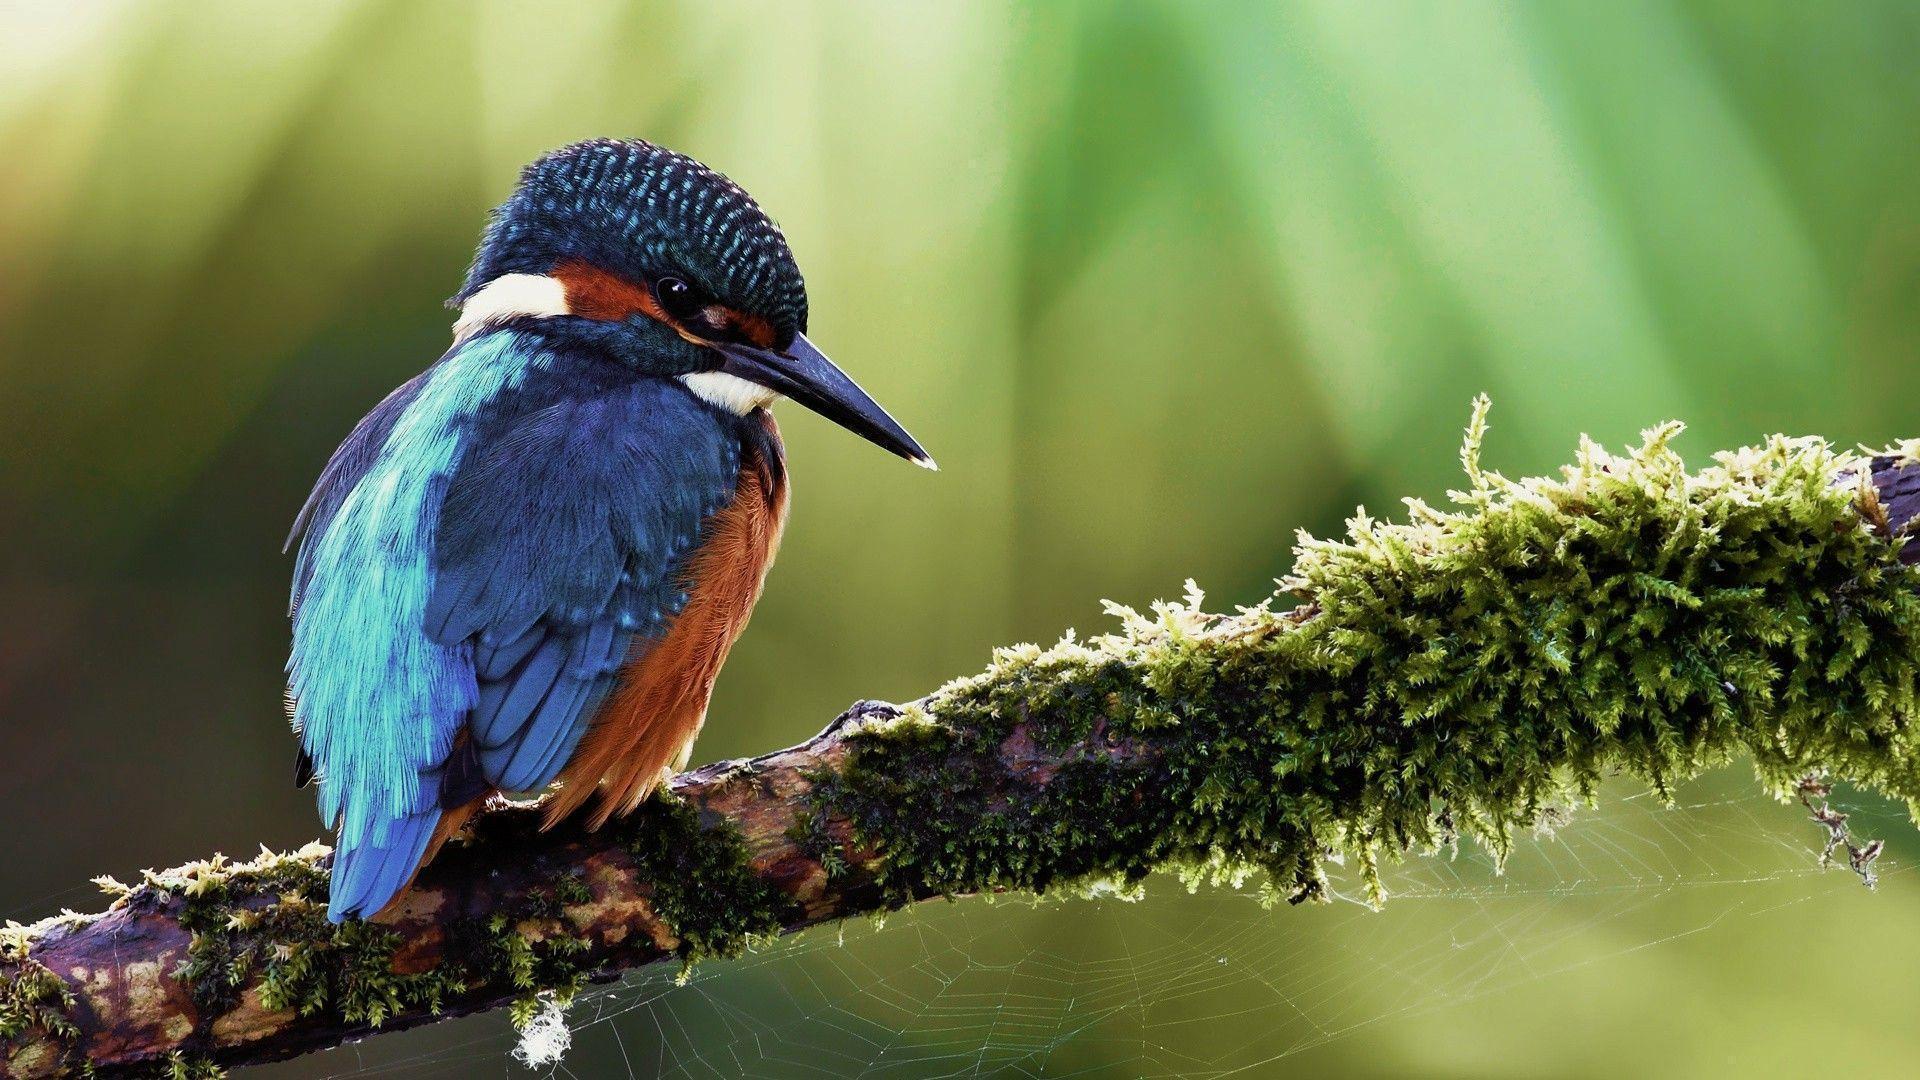 kingfisher wallpapers hd - photo #2